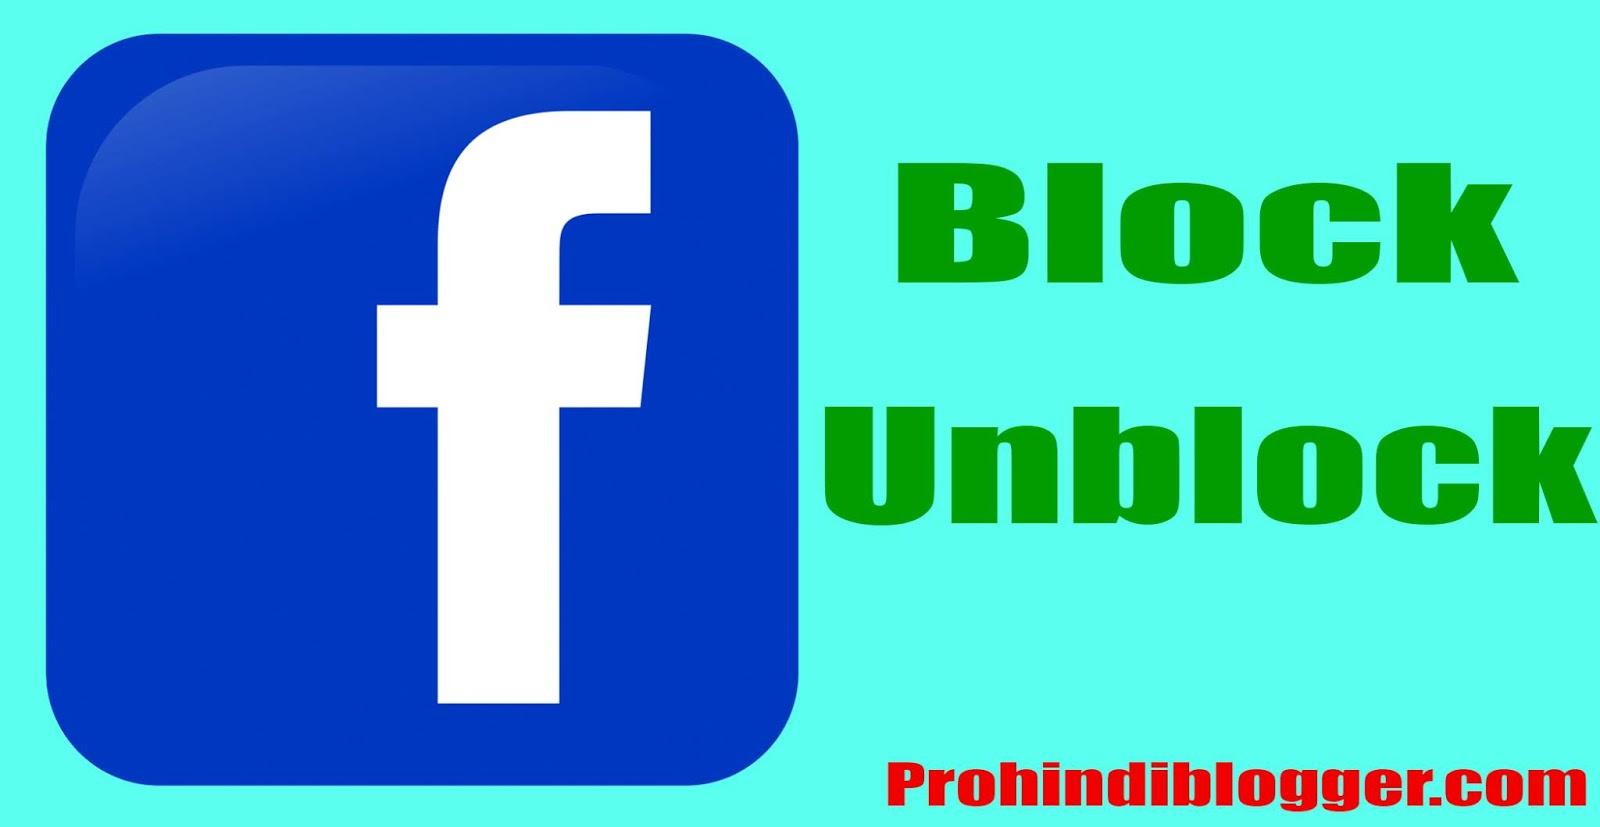 facebook account block kaise kare, facebook account unblock kaise kare